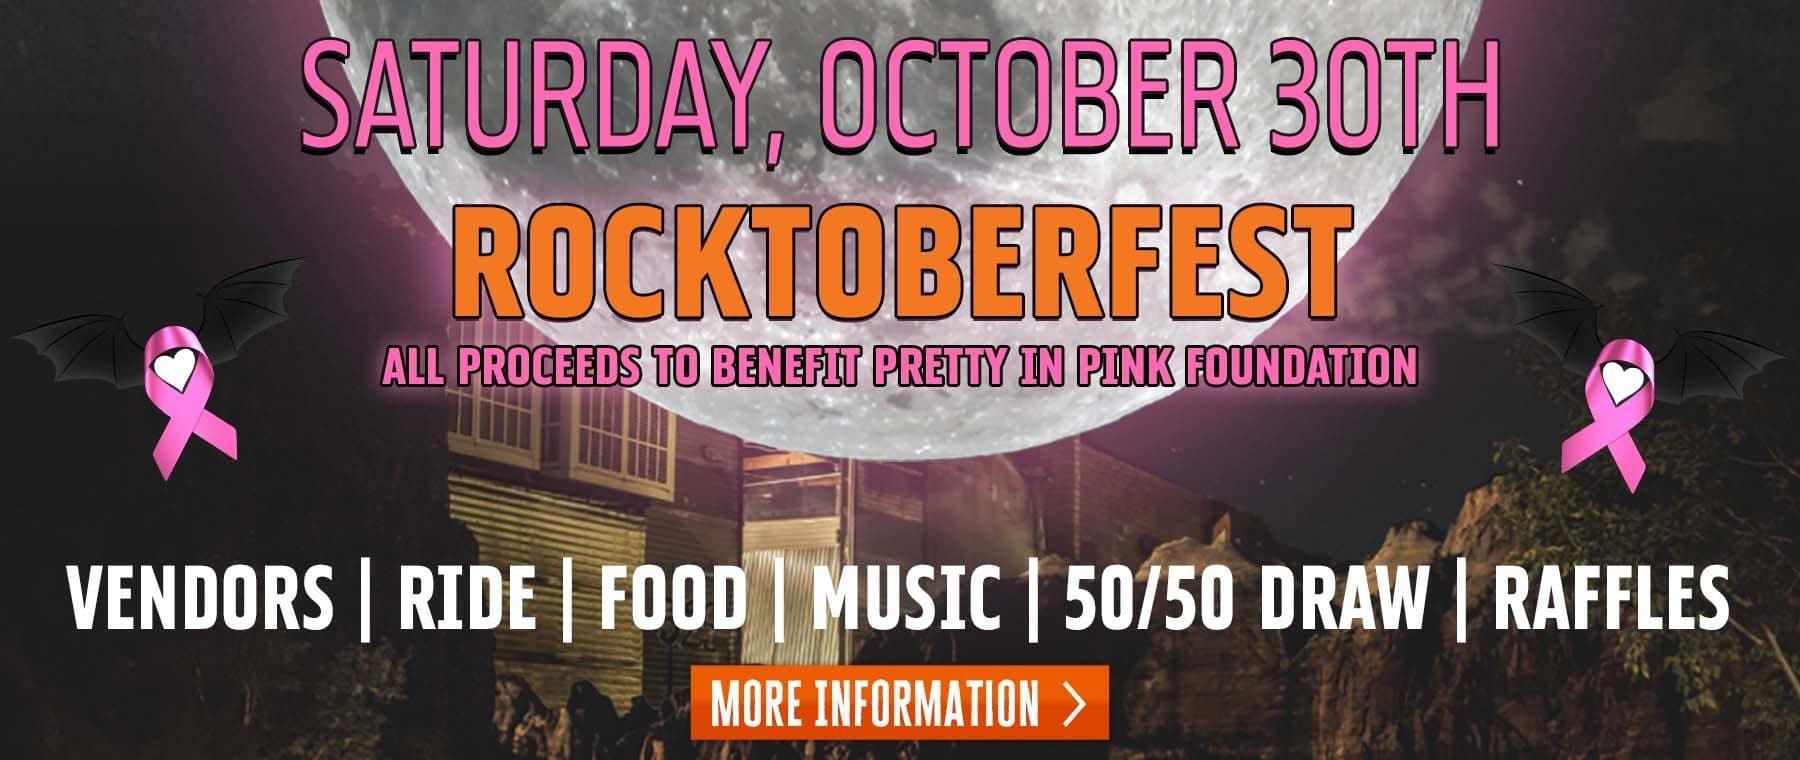 Rocktoberfest – Web Banner 4